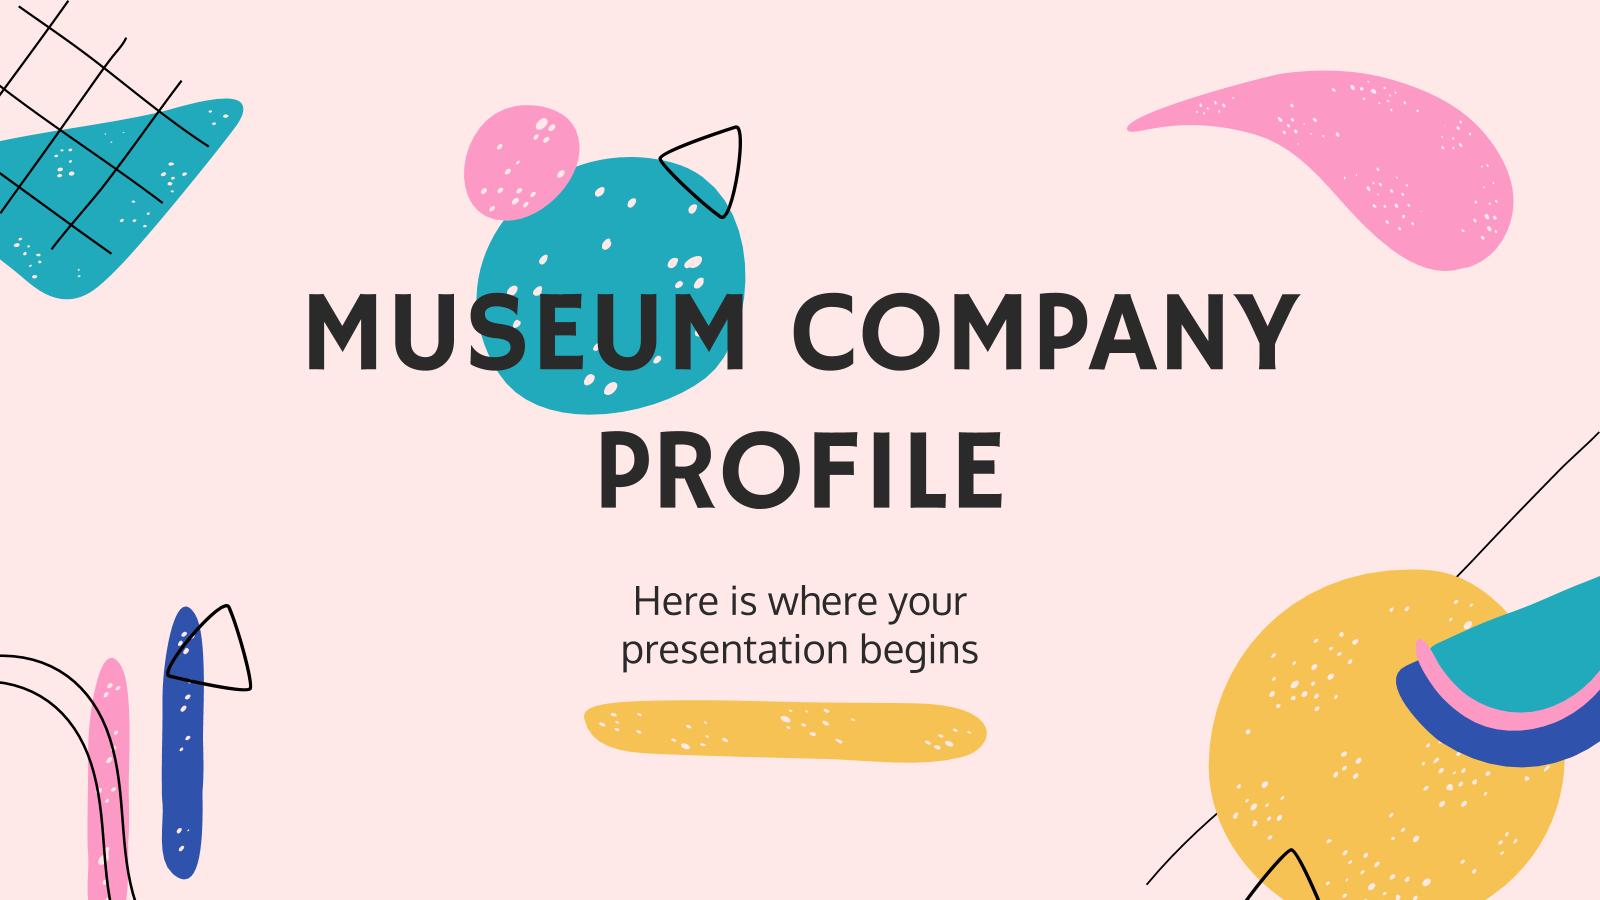 Museum Company Profile presentation template